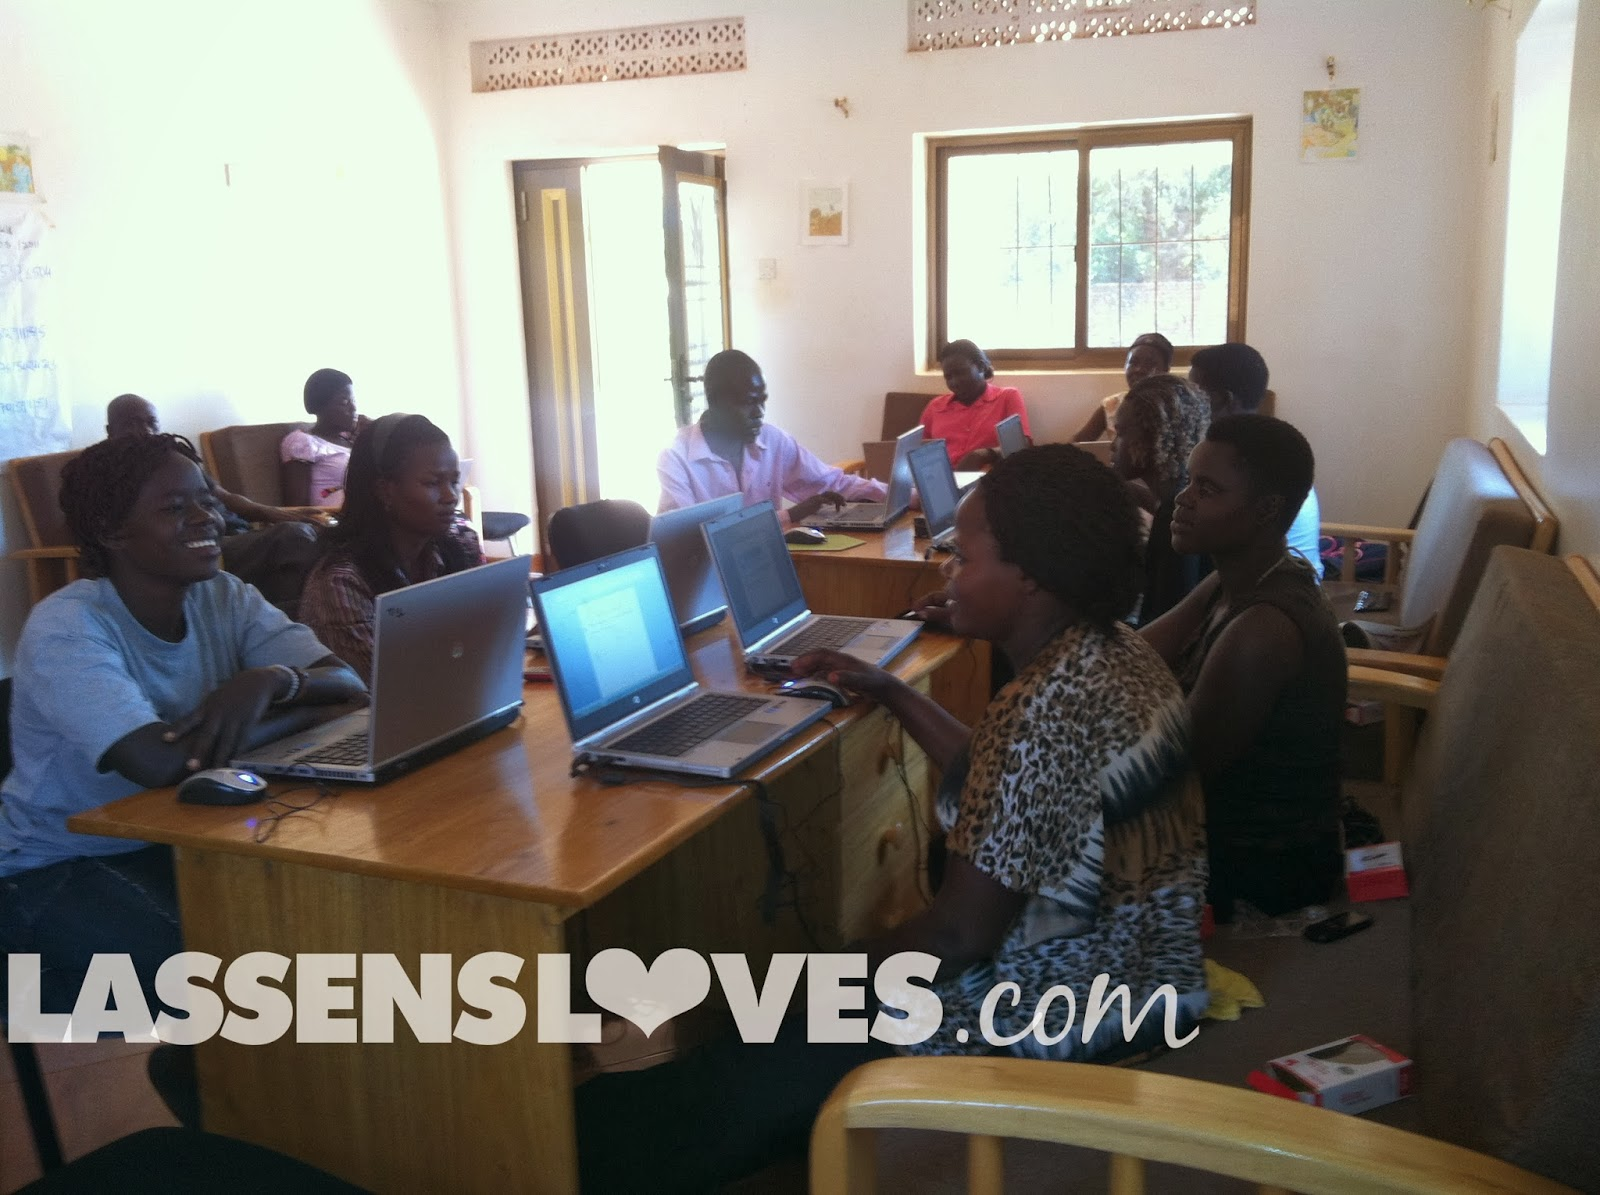 lassensloves.com, Lassen's, Gulu+Uganda, computer+literacy, thrive+gulu